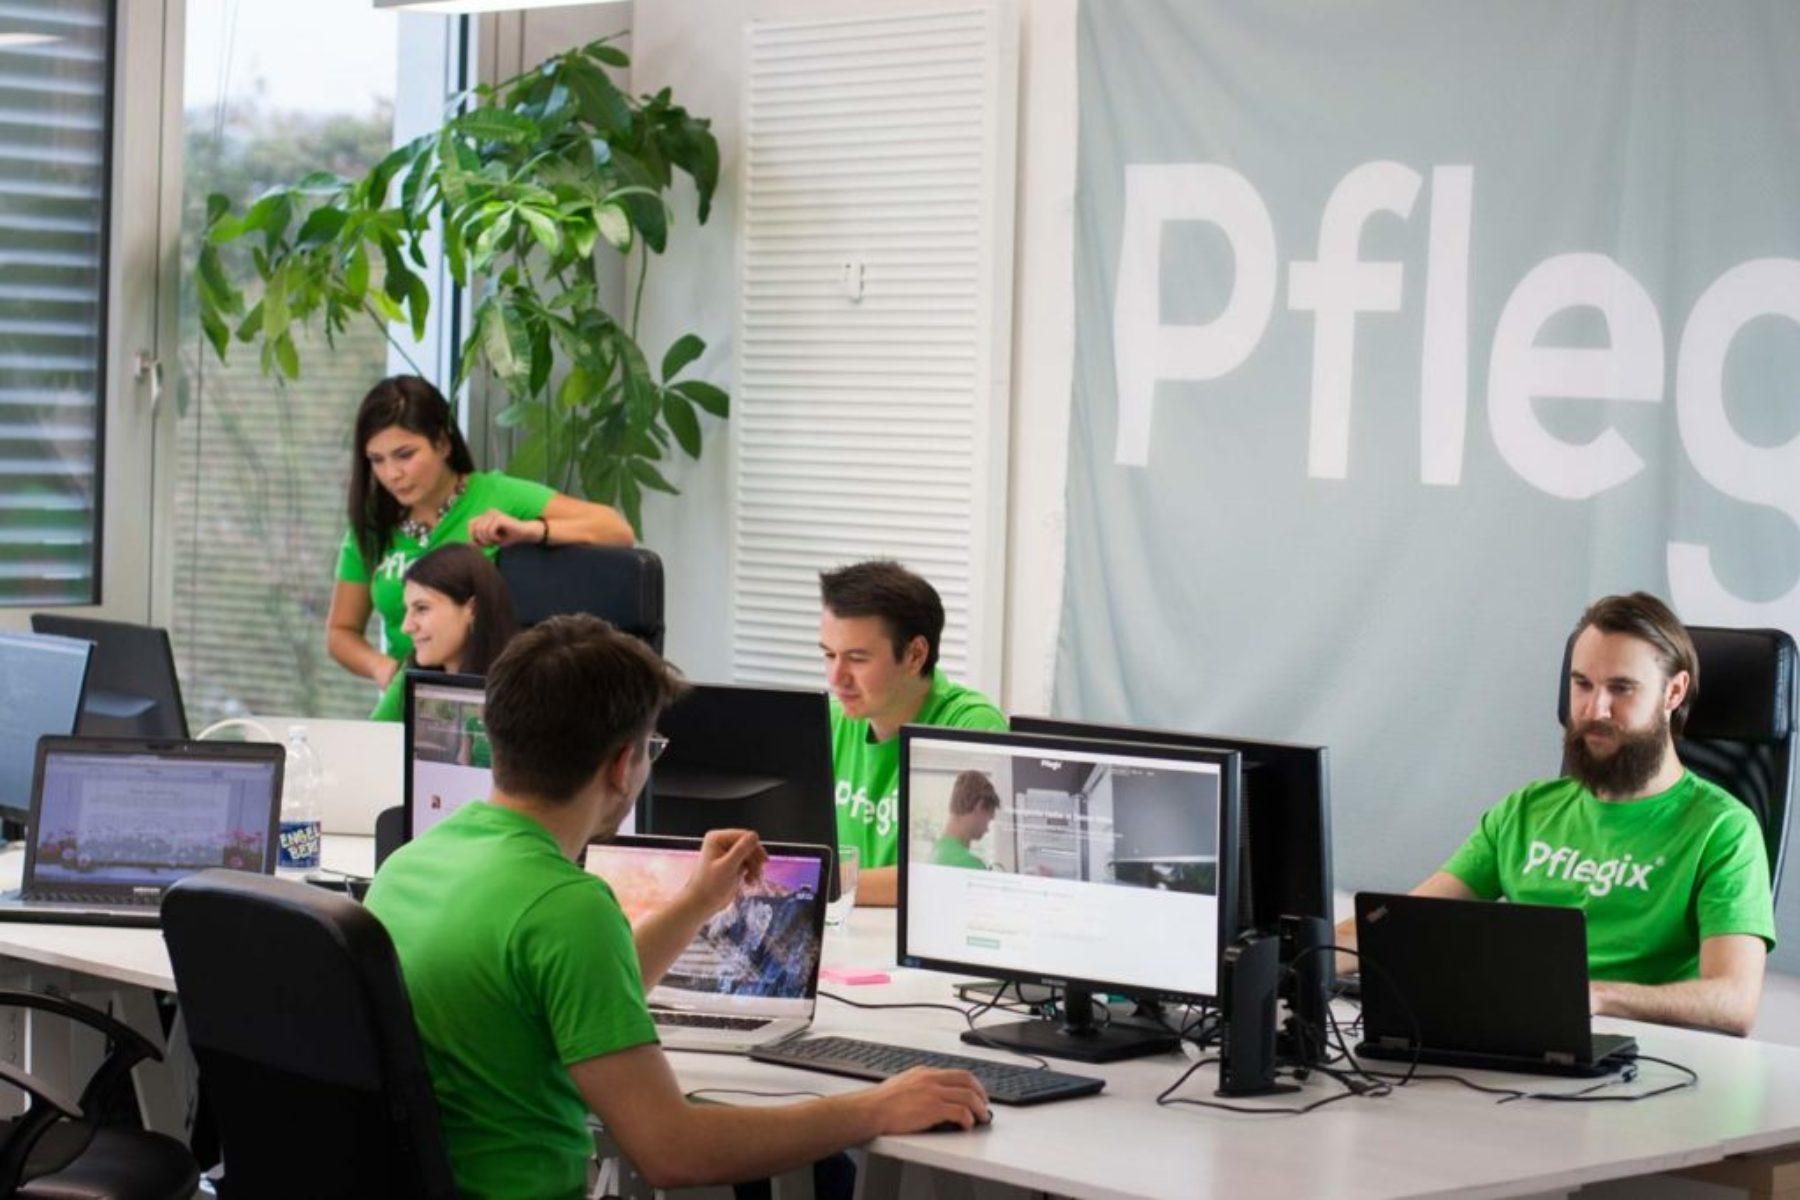 5_Pflegix_Office